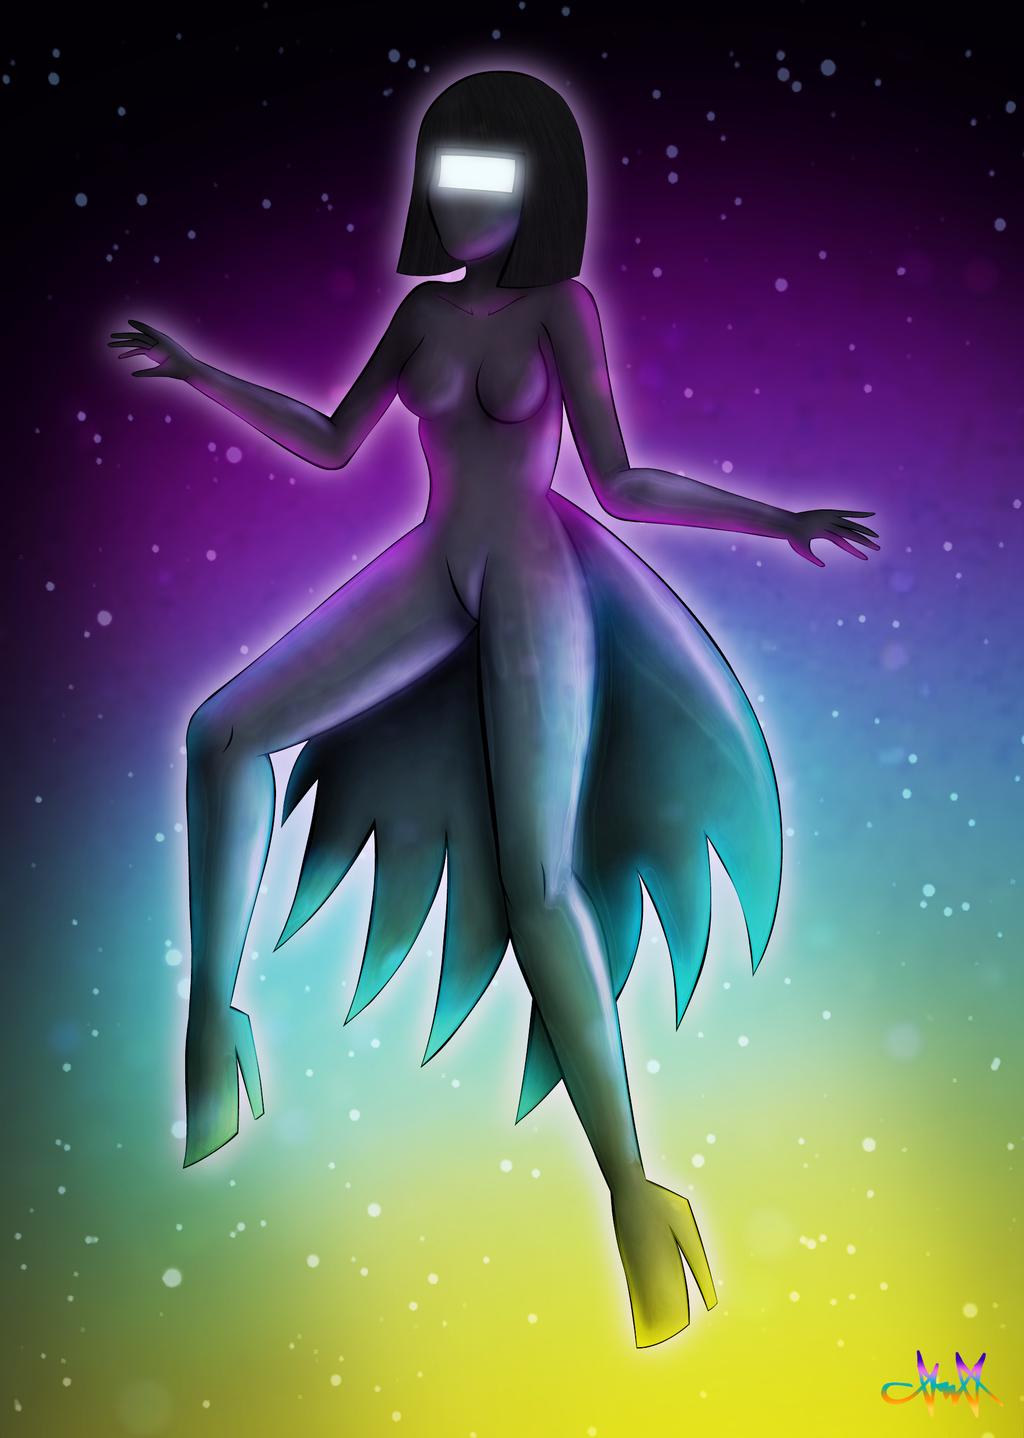 Art Trade for Poka-SorM: Commander Showgirl by gagaman92